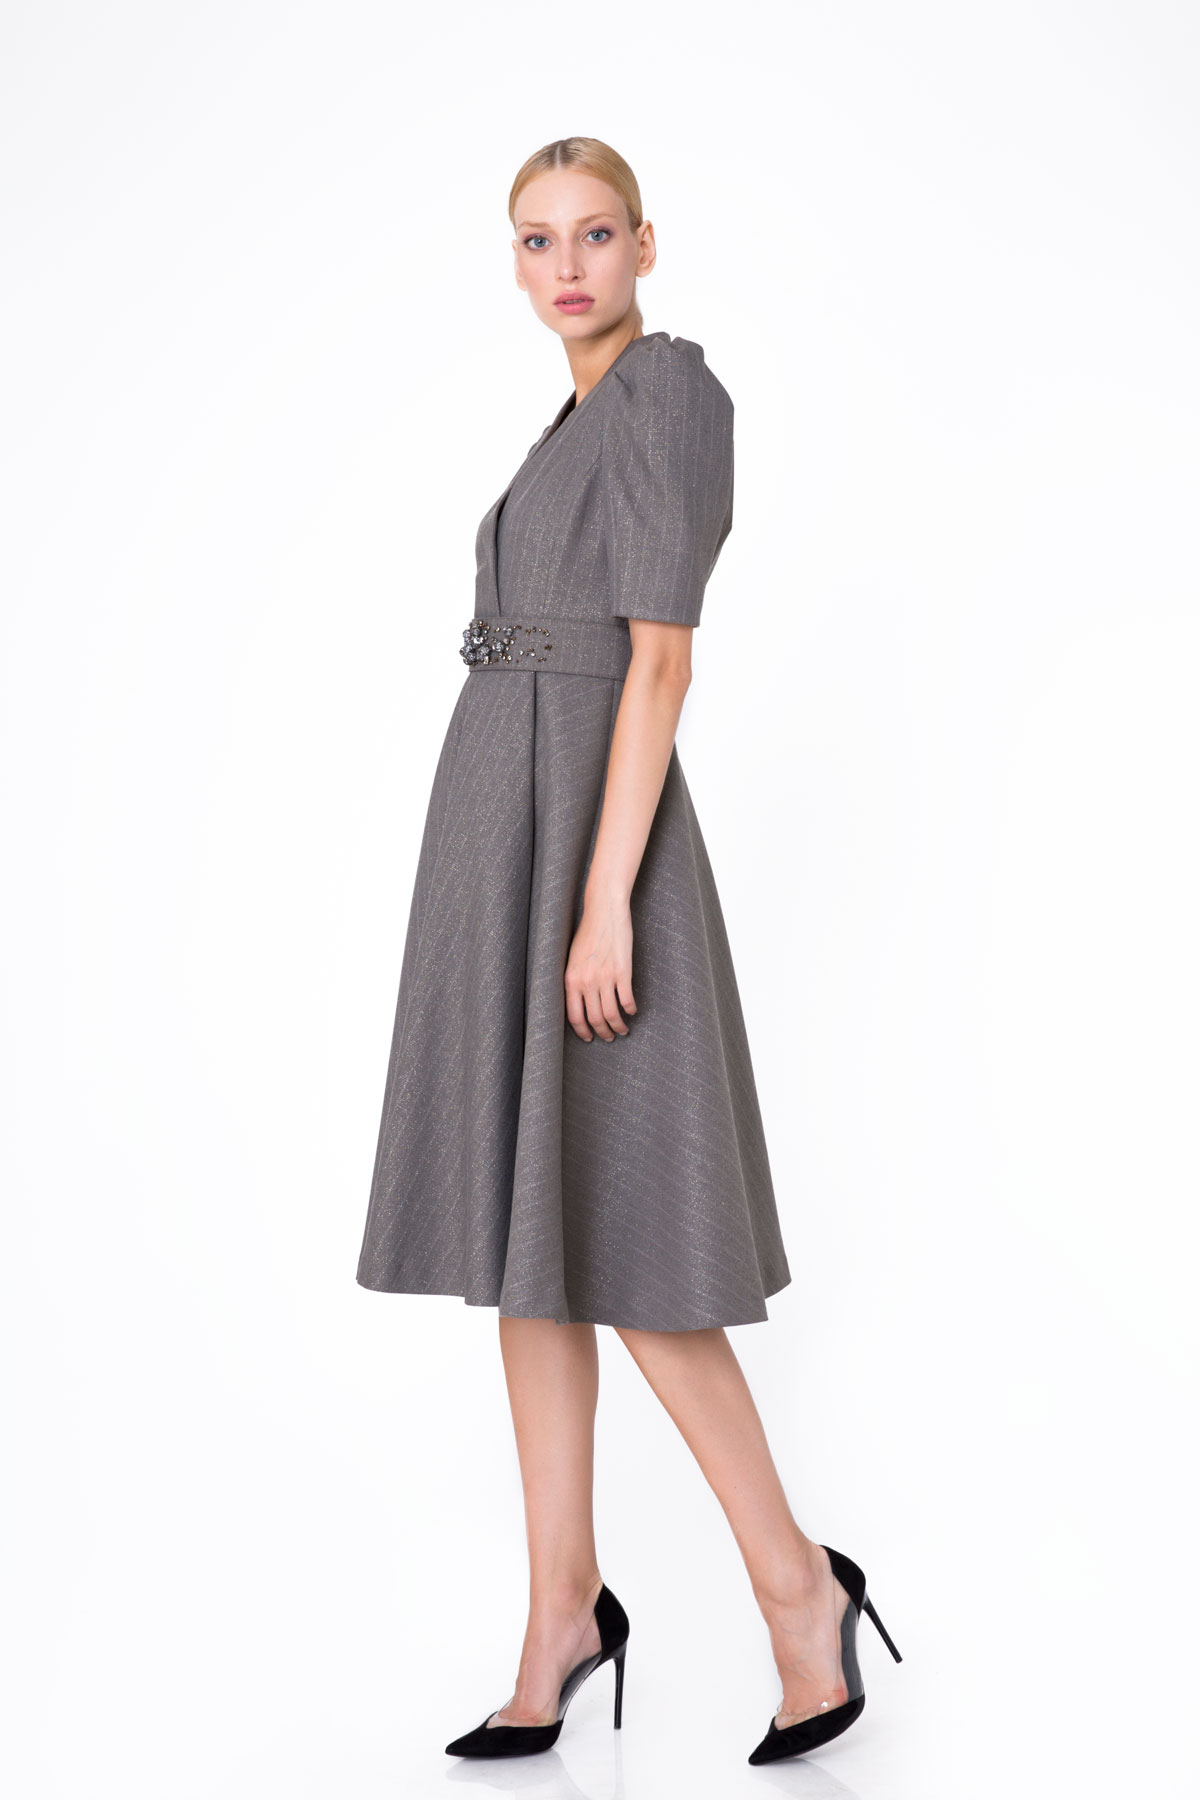 Stone Detailed Flared Midi Grey Dress